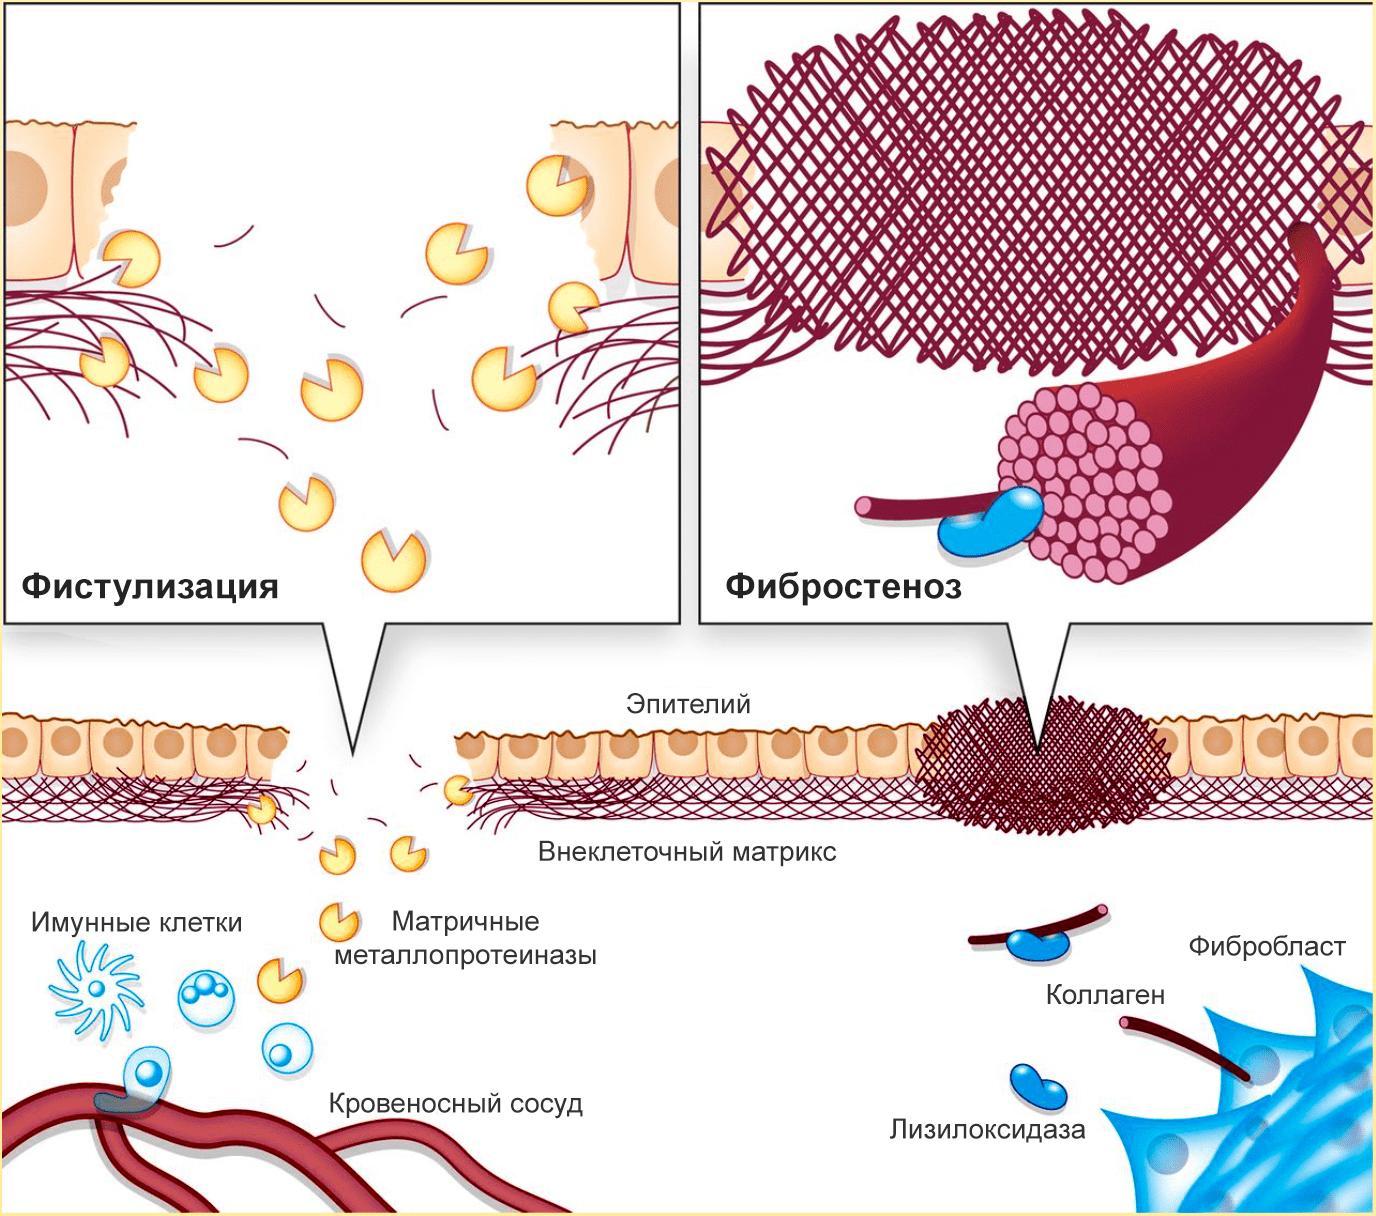 При болезни Крона происходит фистулизация и фибростеноз кишечника